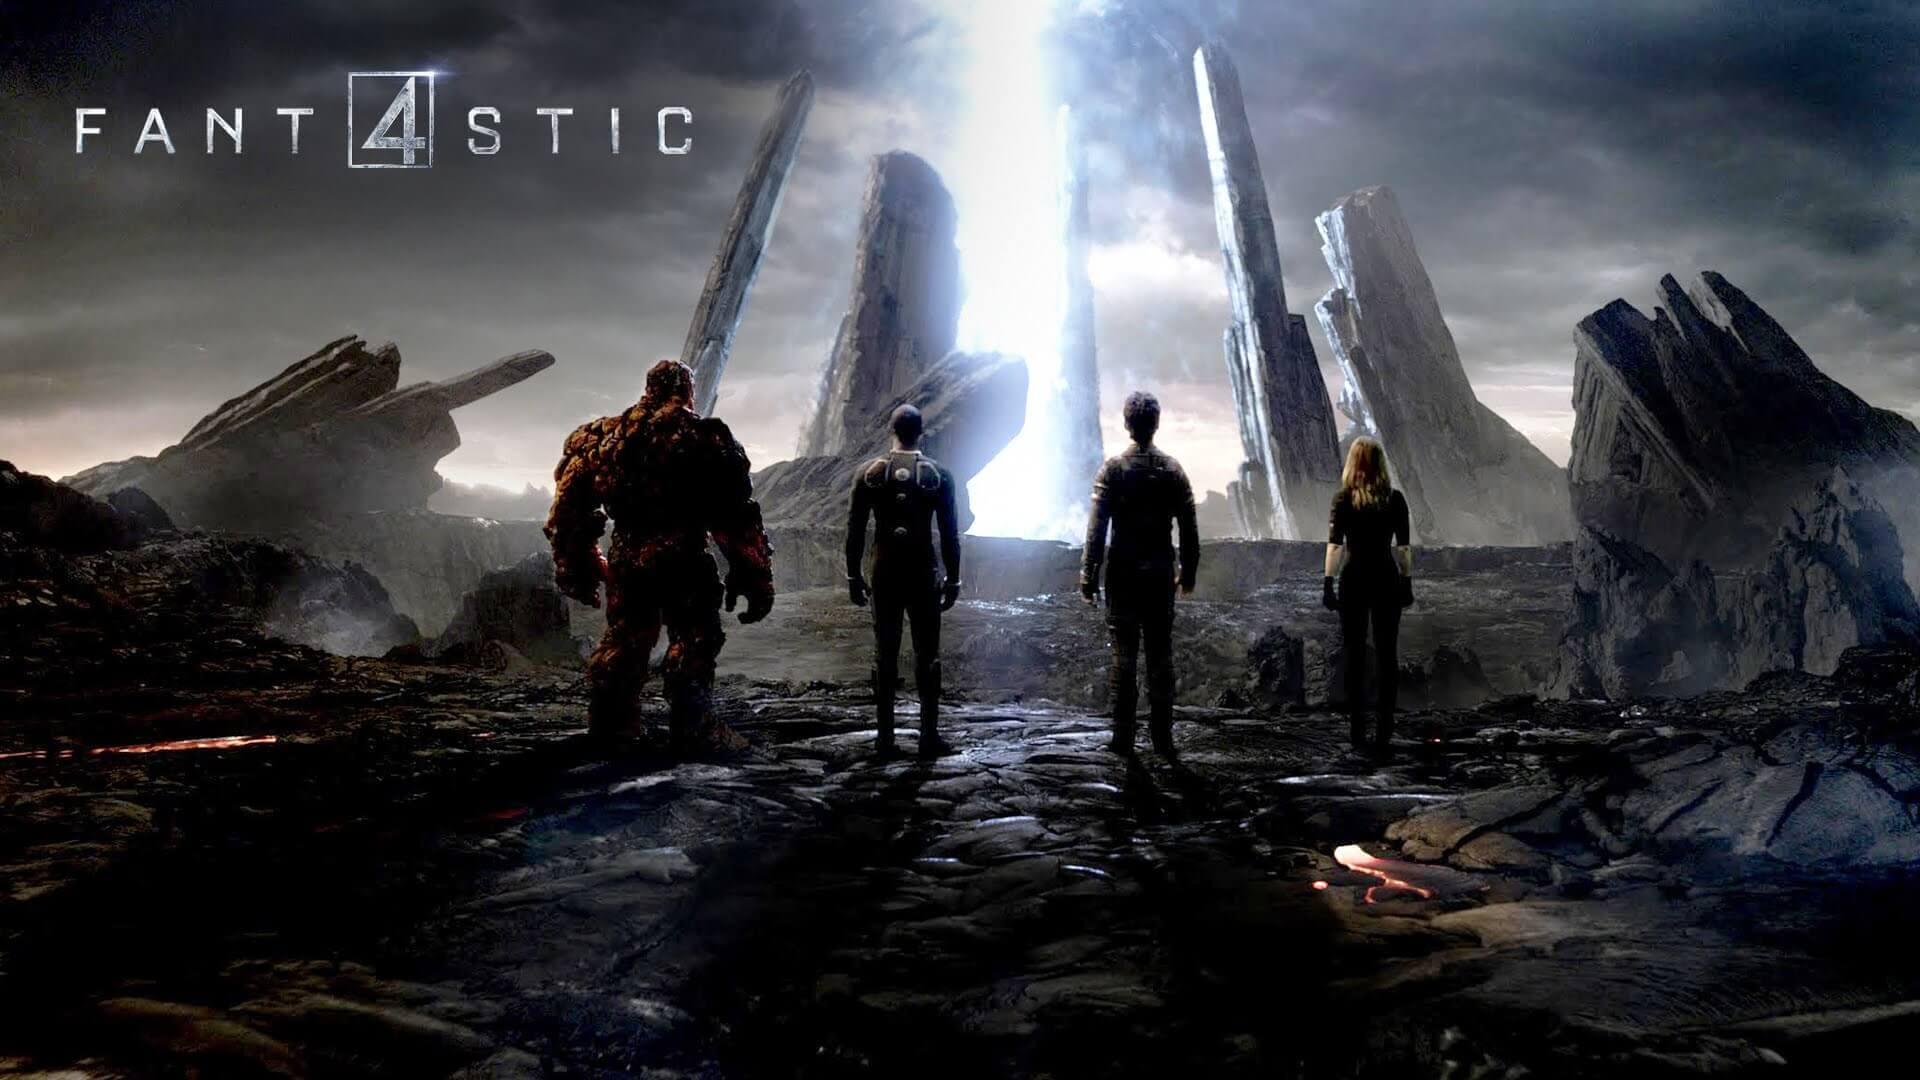 fantastic-four-2015-trailer